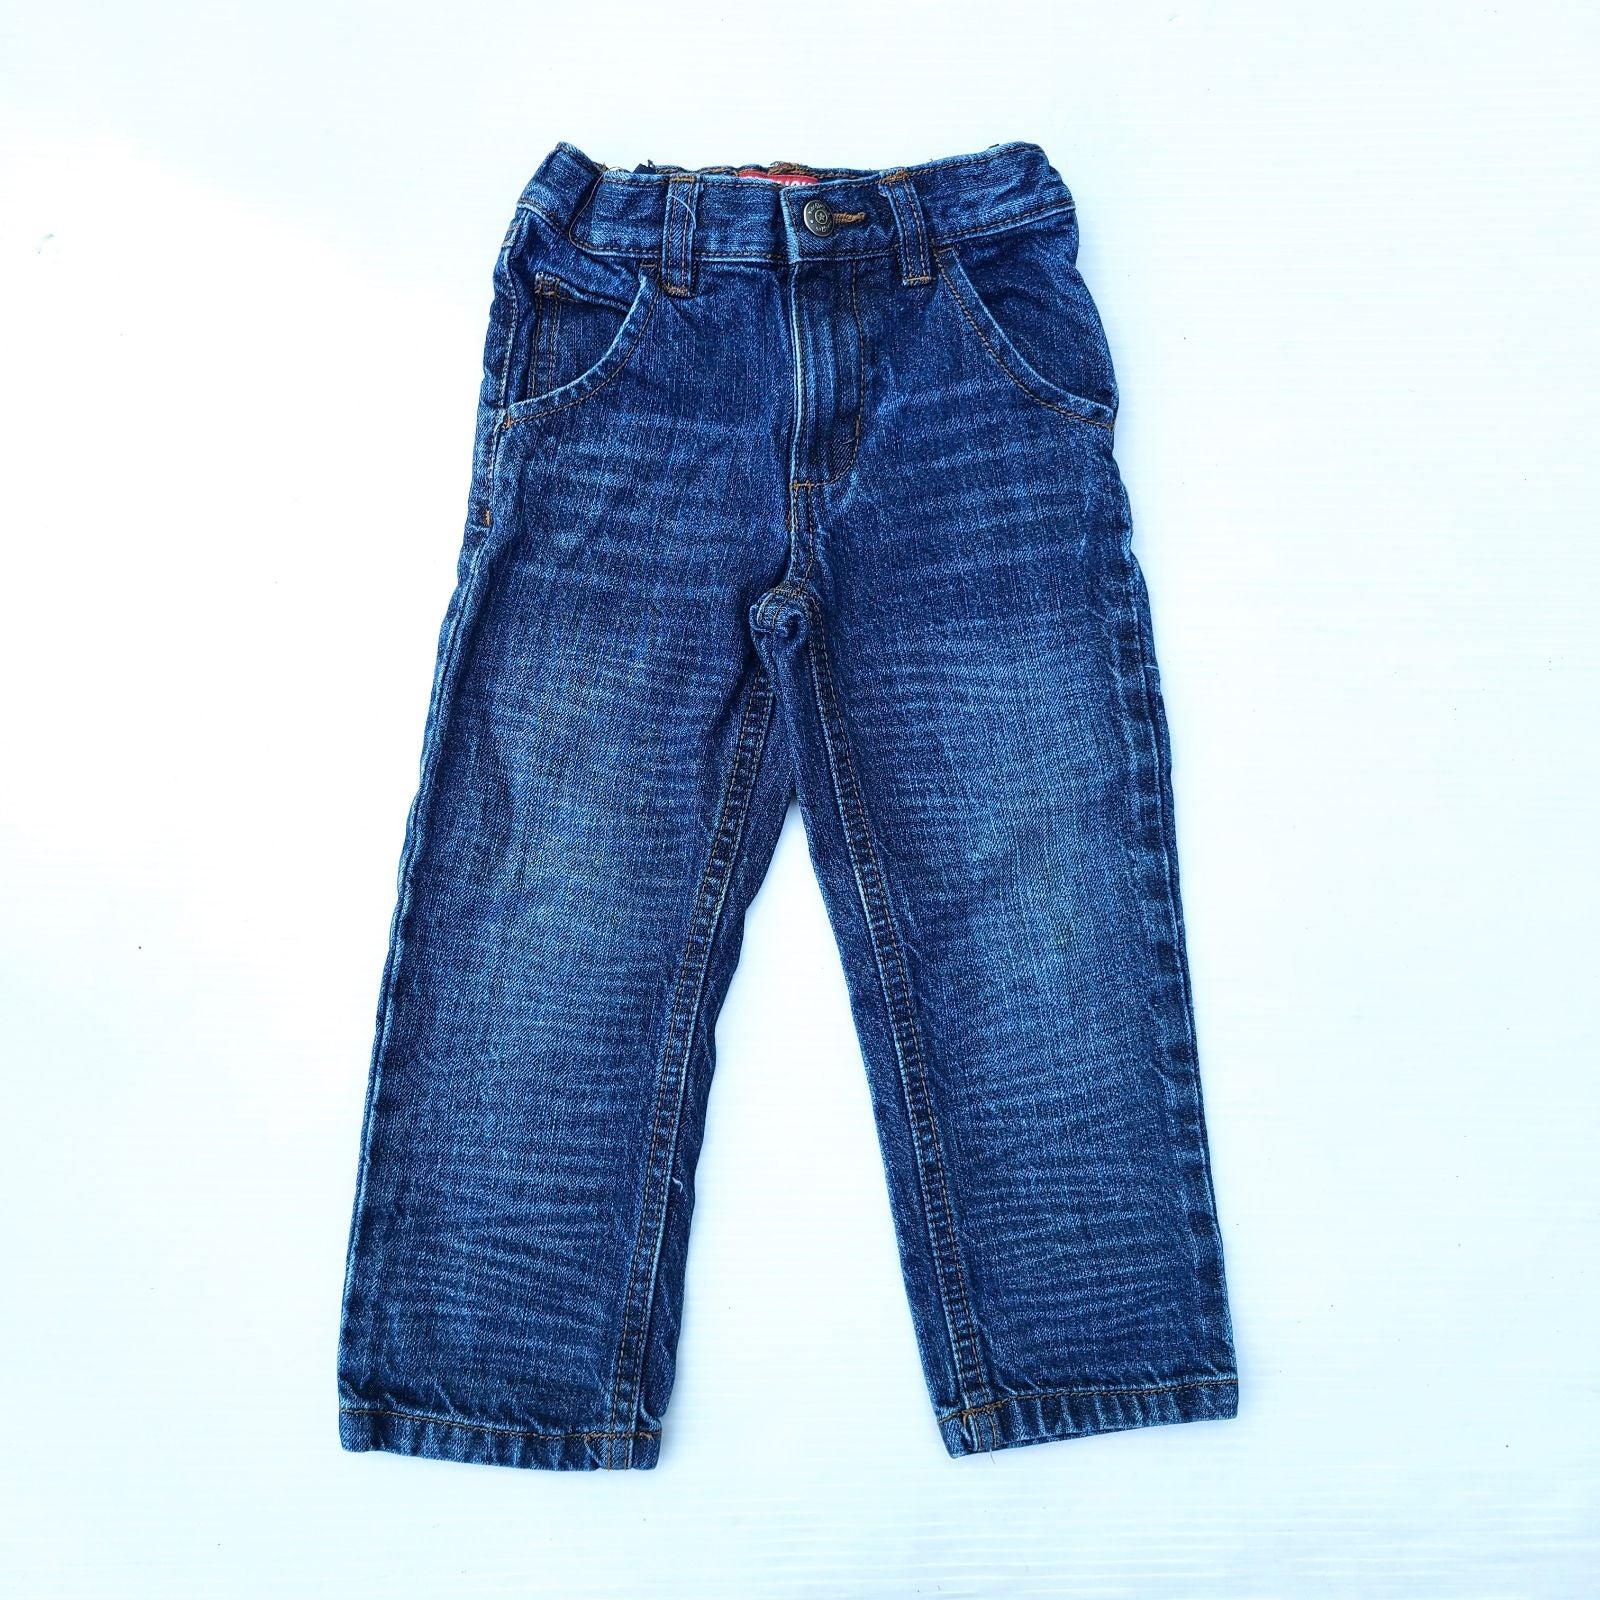 Kids R Us boys blue jeans 2t